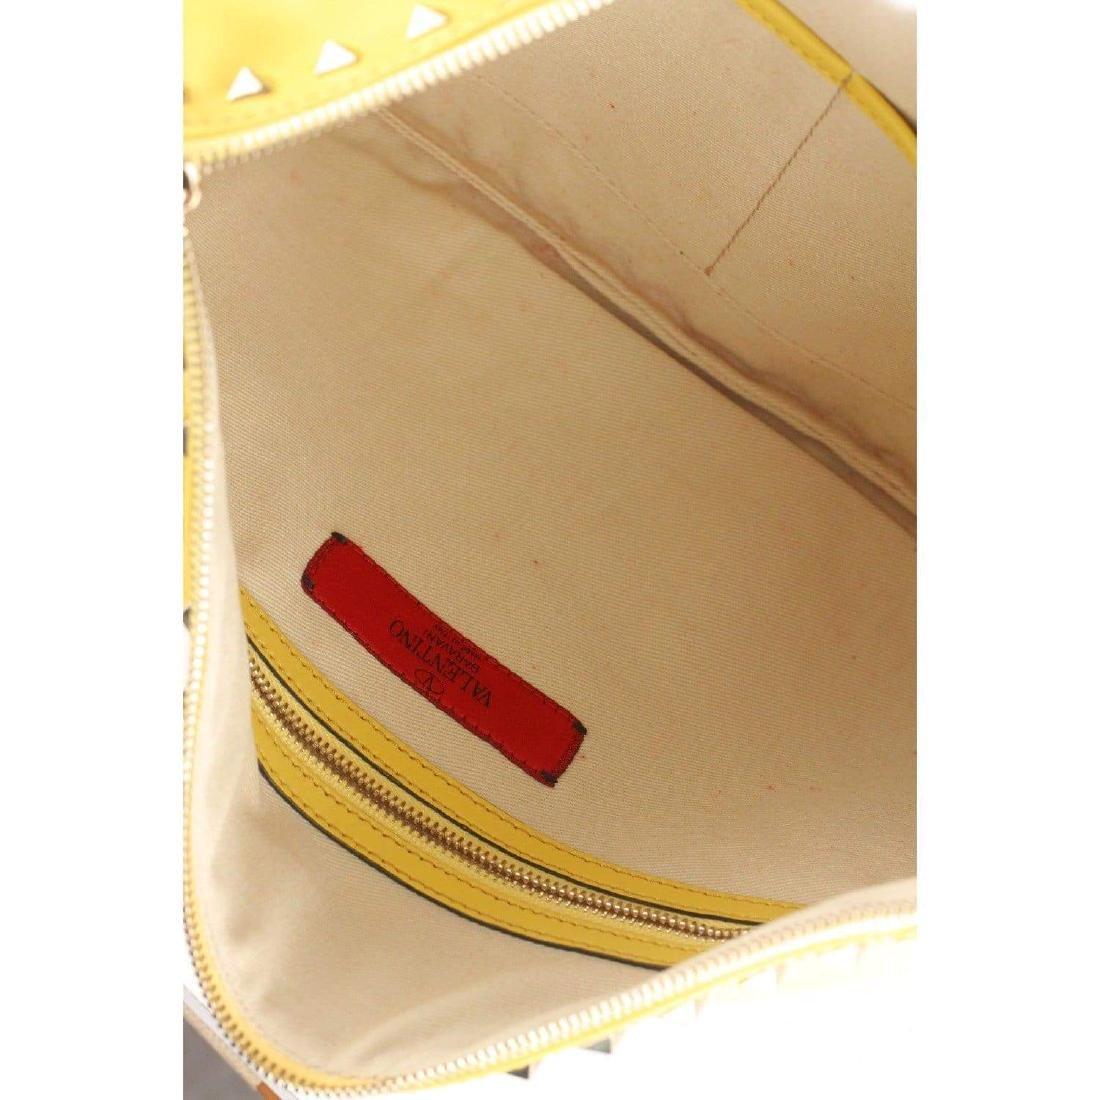 Valentino Rockstud Large Clutch Wrist Bag - 7